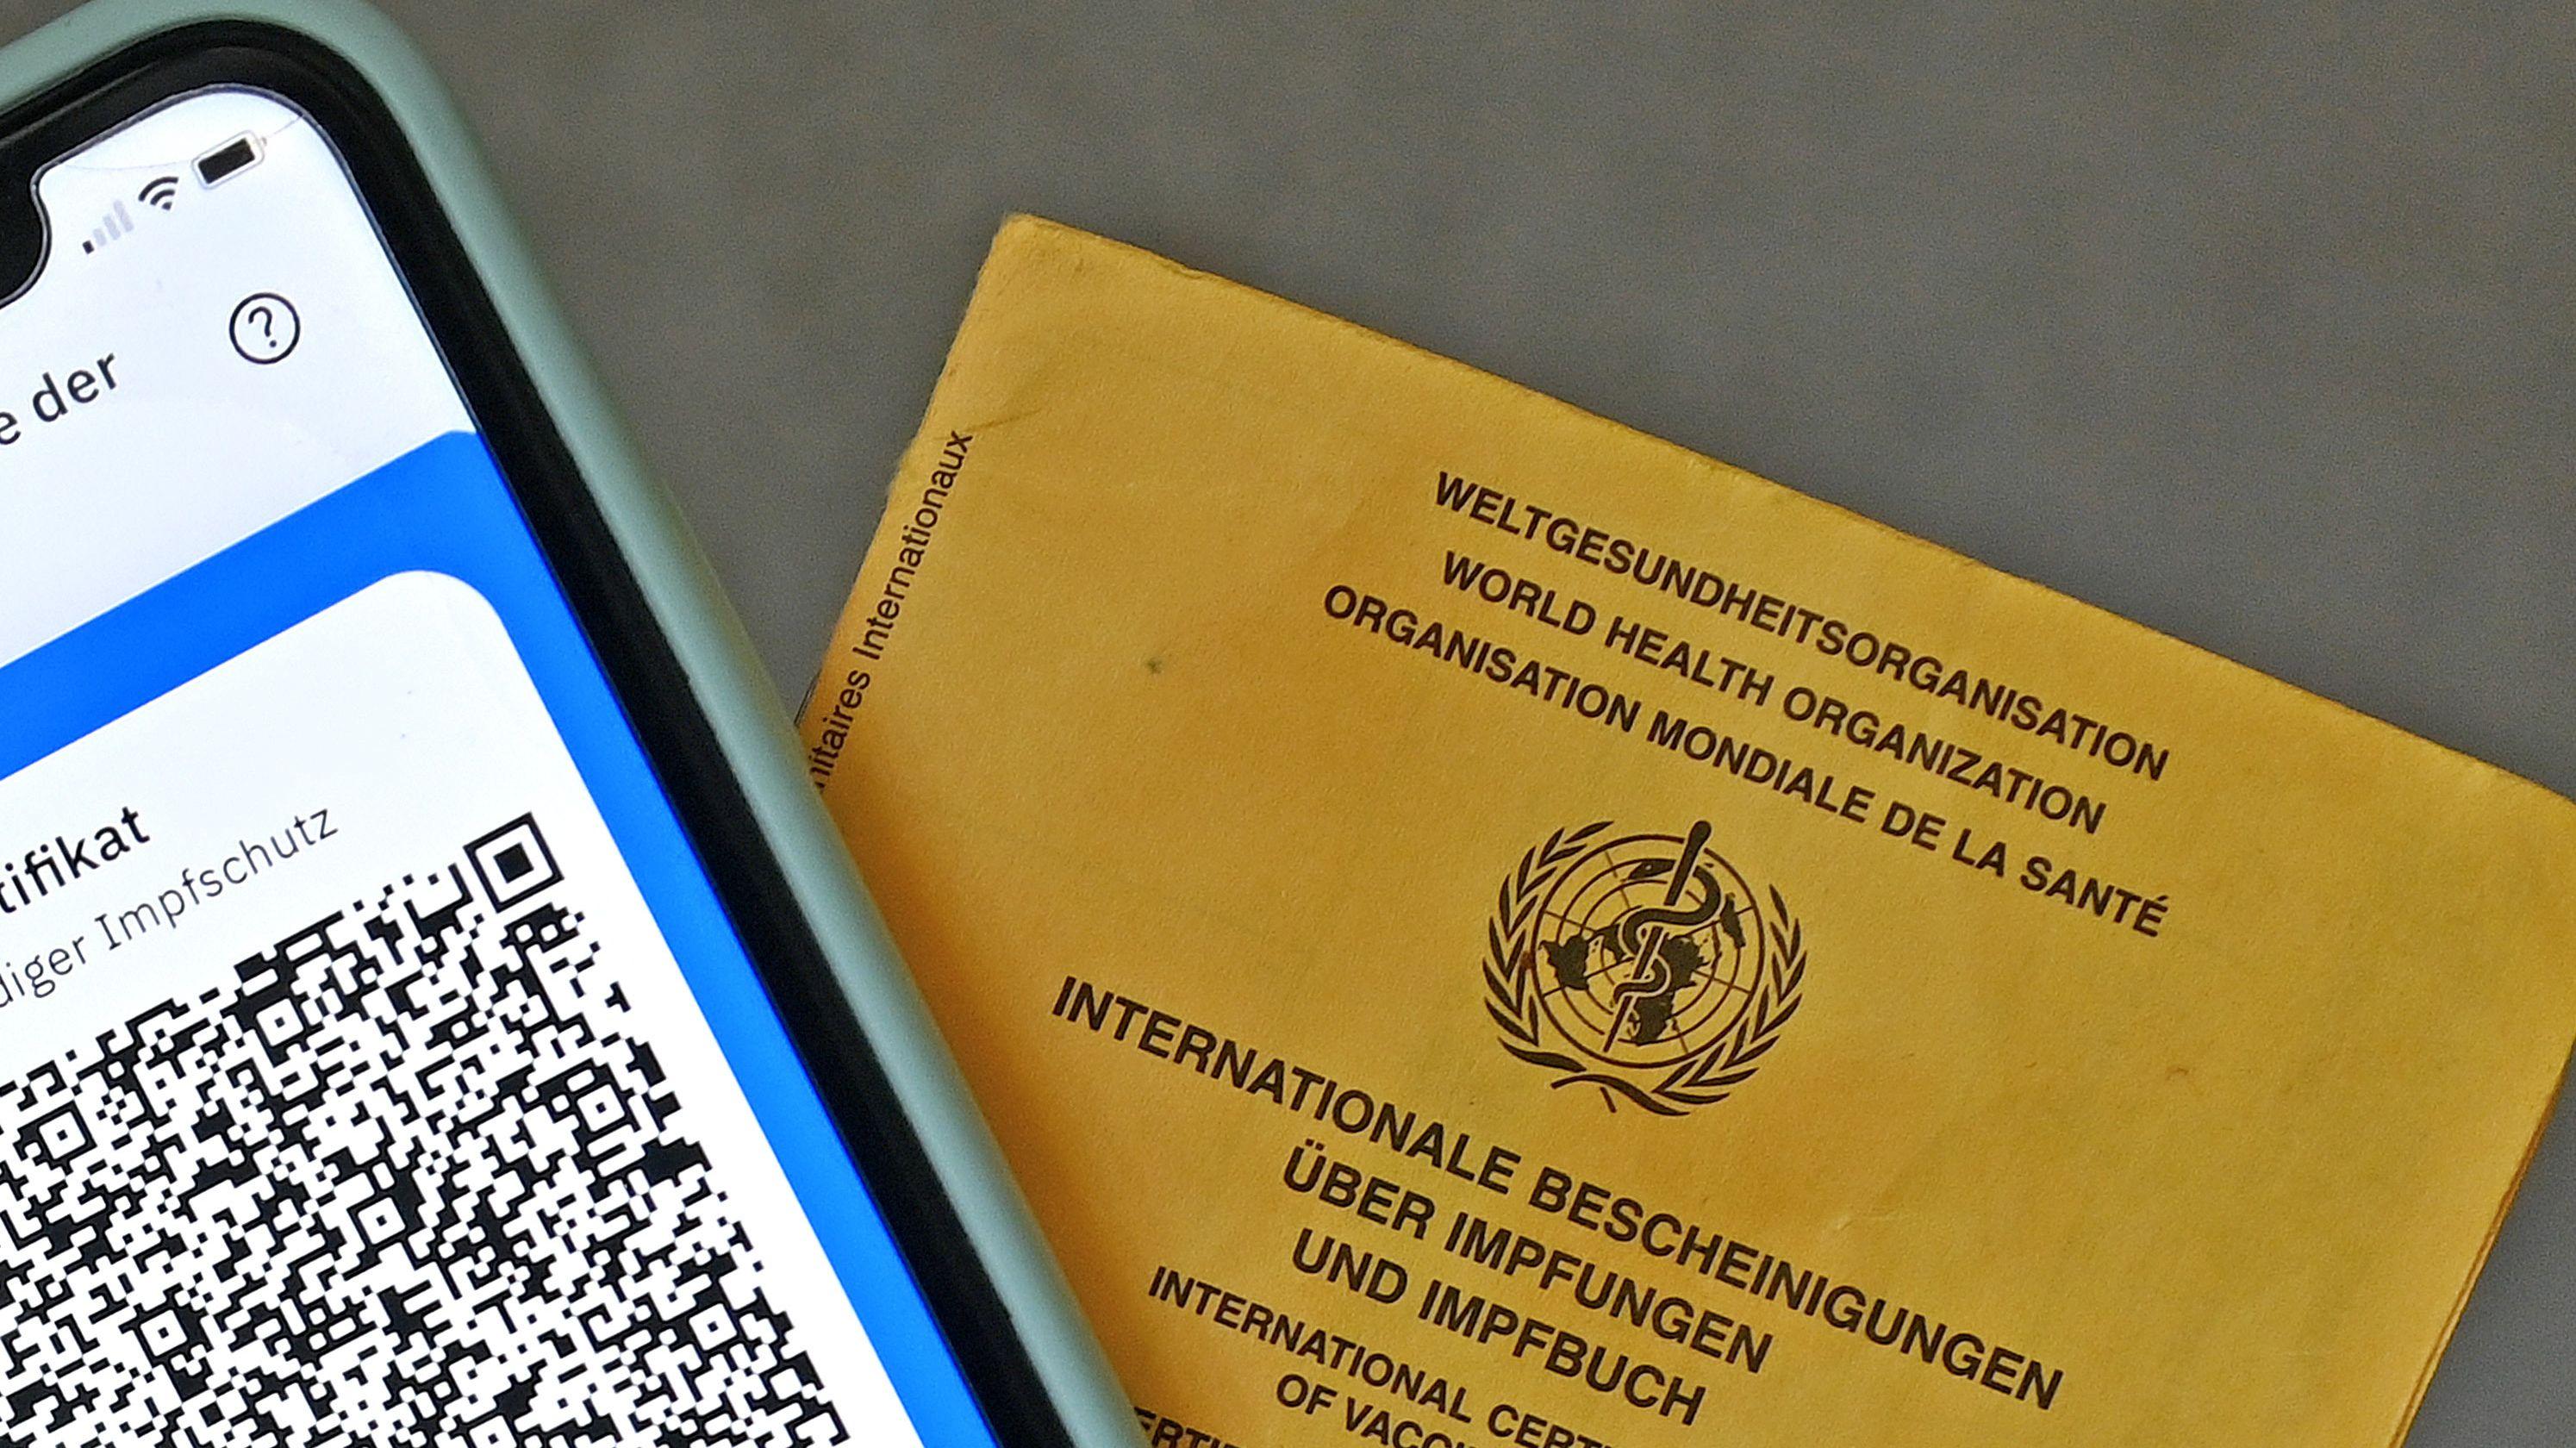 Digitaler Impfausweis / Gelbes Heftchen